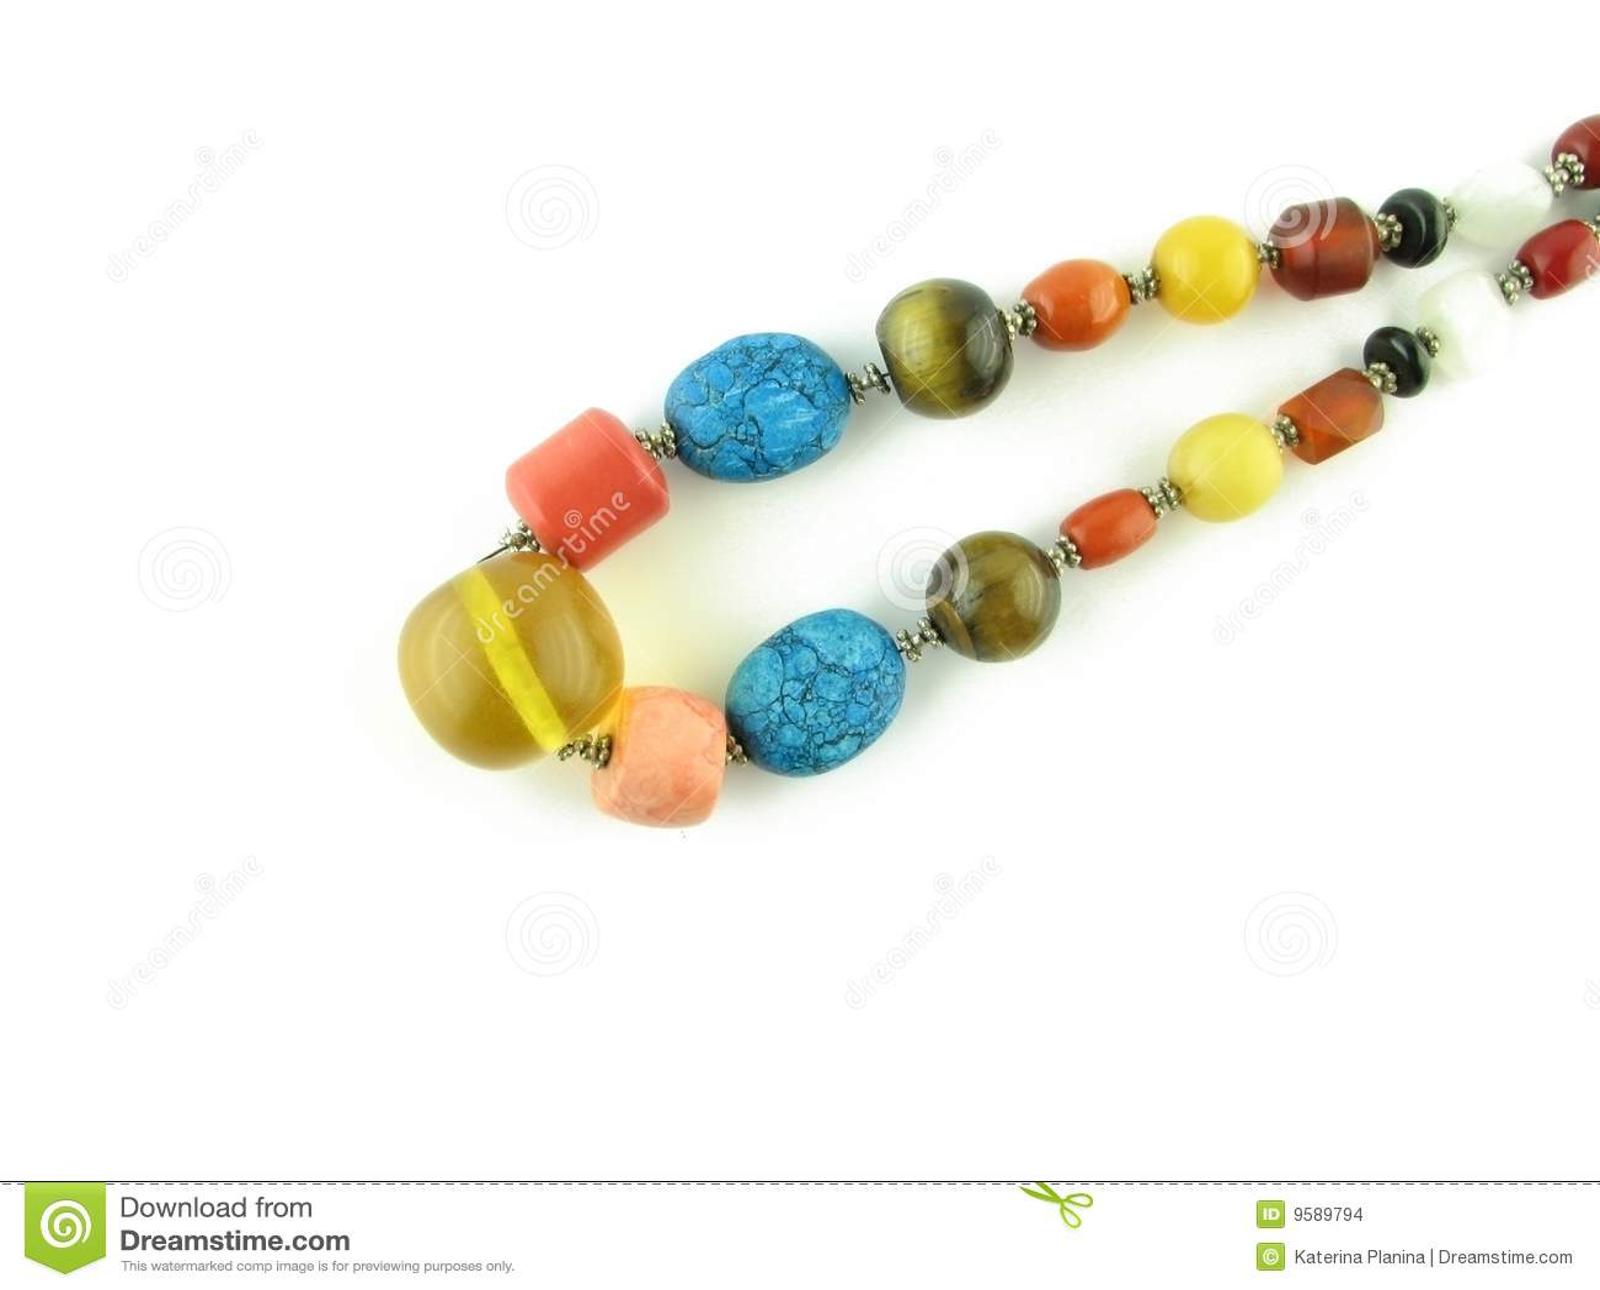 The Tibetan beads